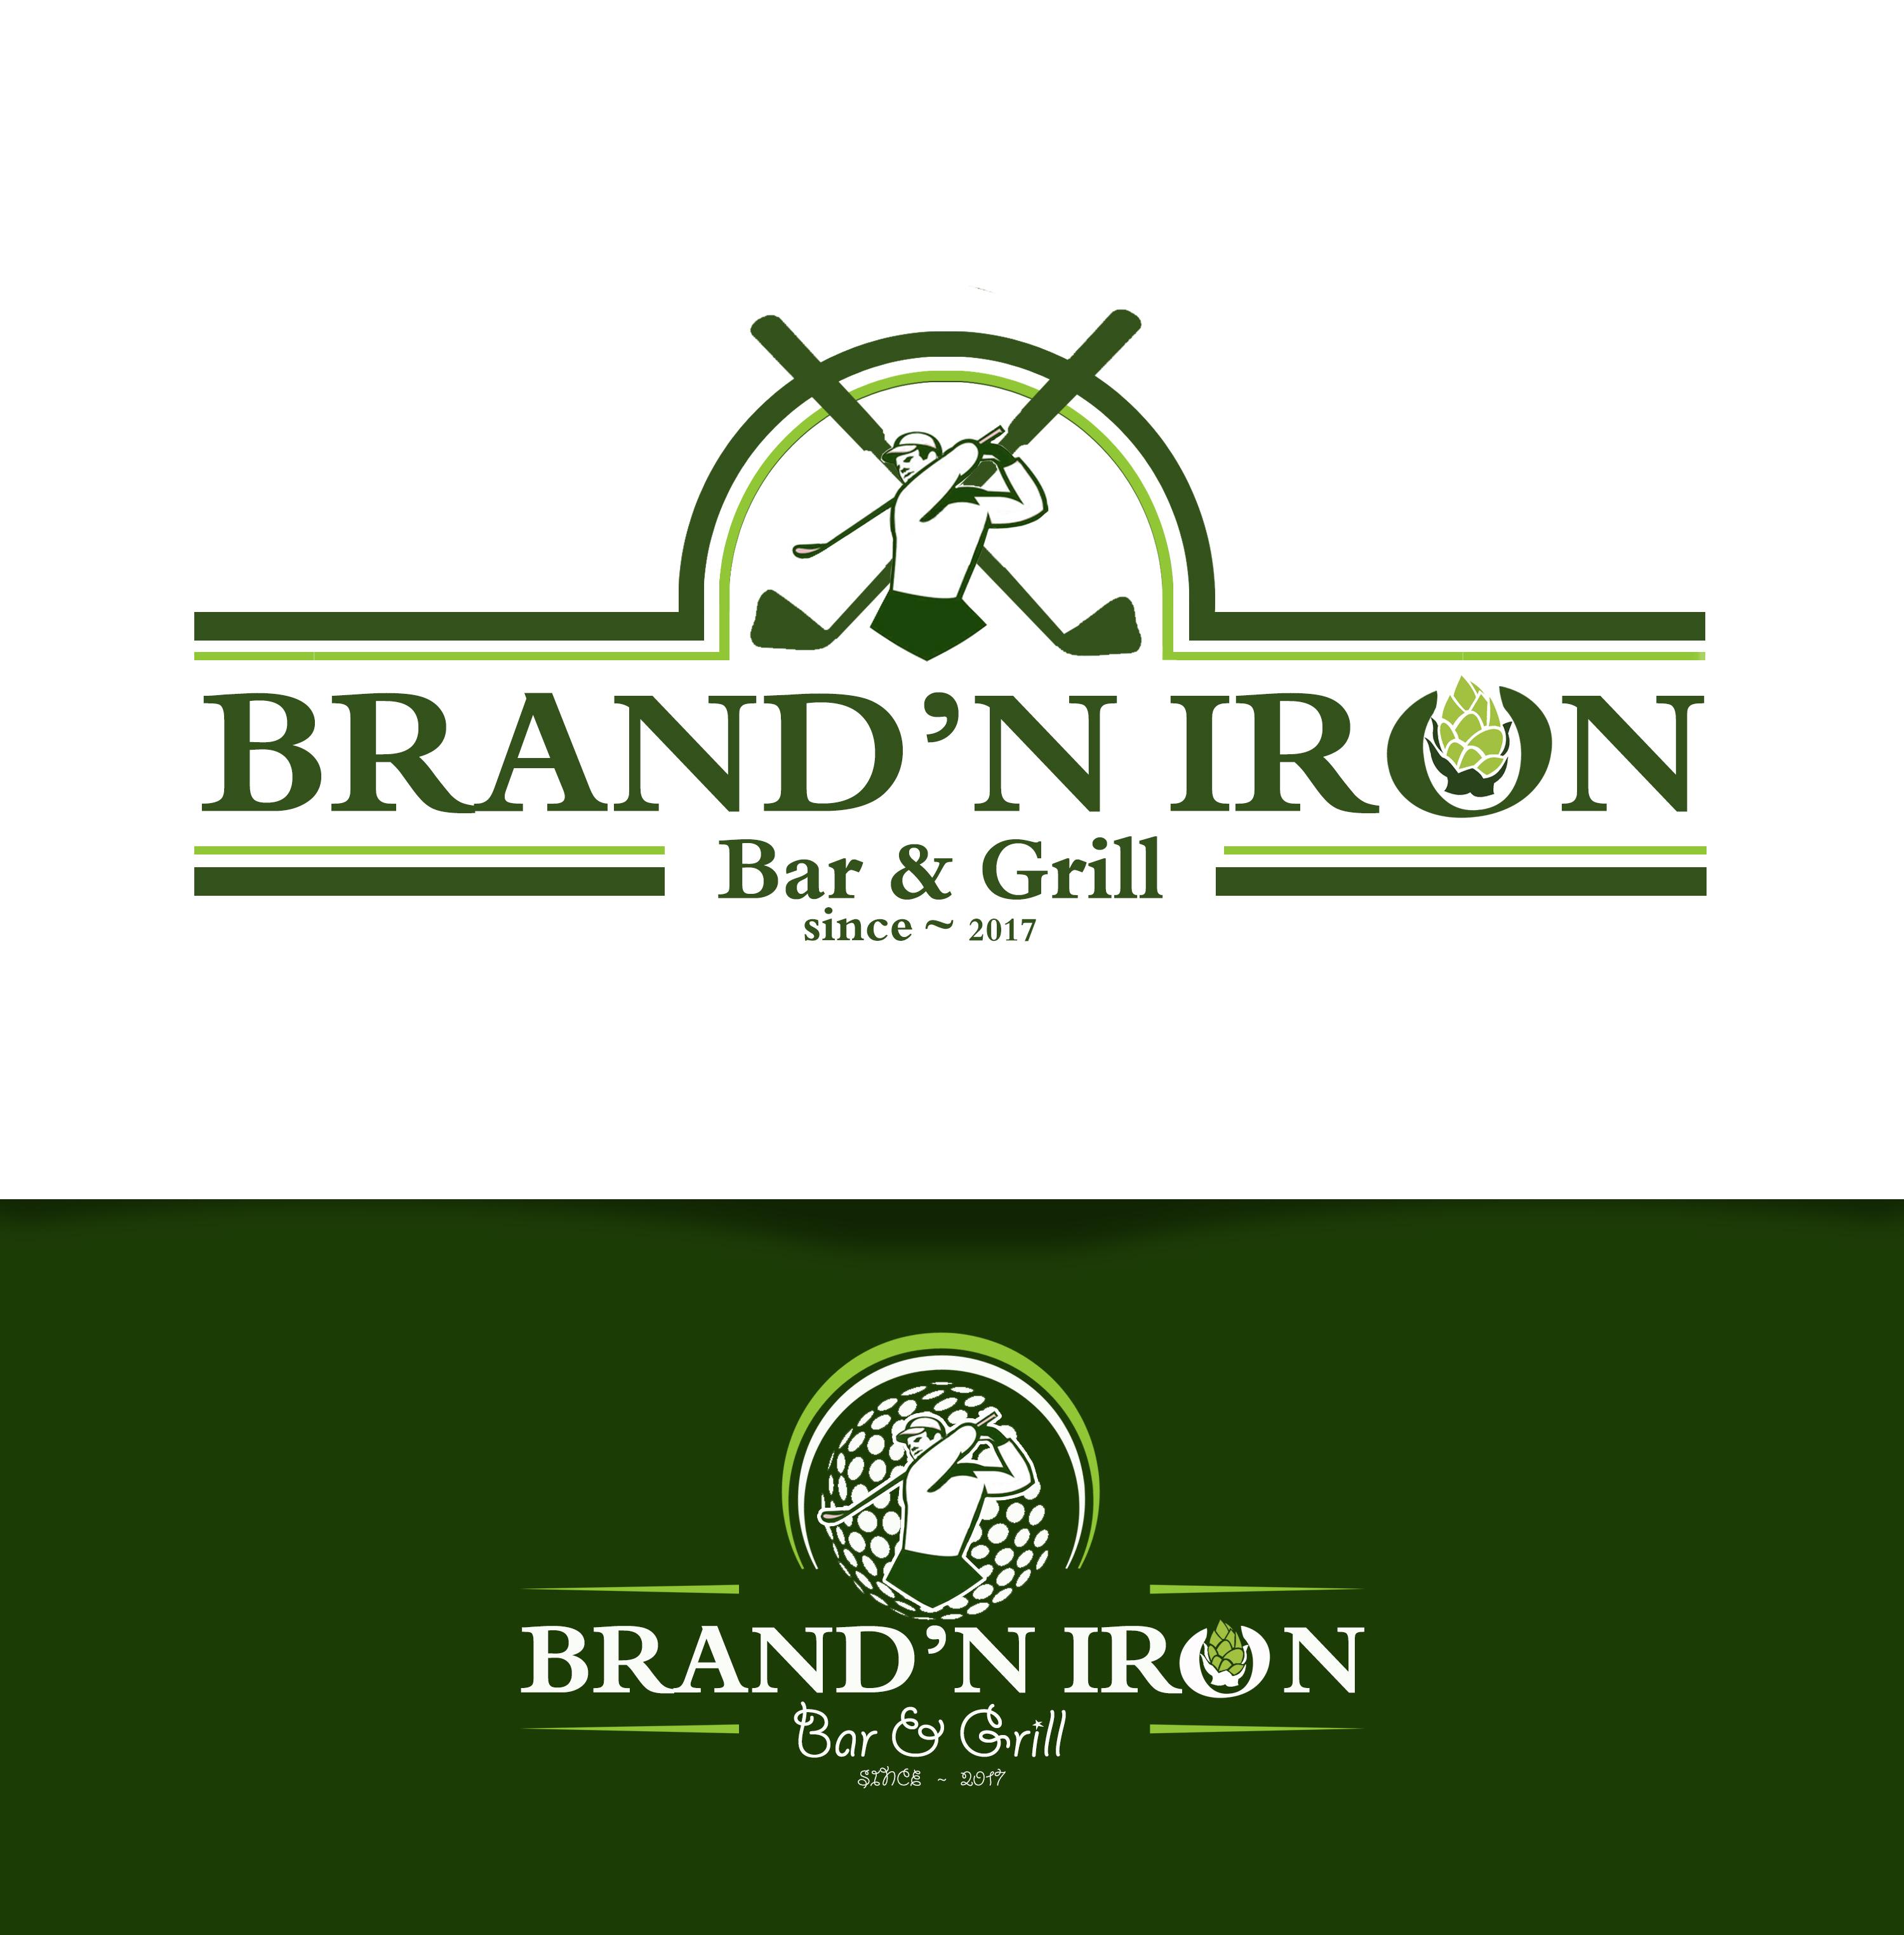 Logo Design by JSDESIGNGROUP - Entry No. 174 in the Logo Design Contest Captivating Logo Design for Brand'n Iron Bar & Grill.